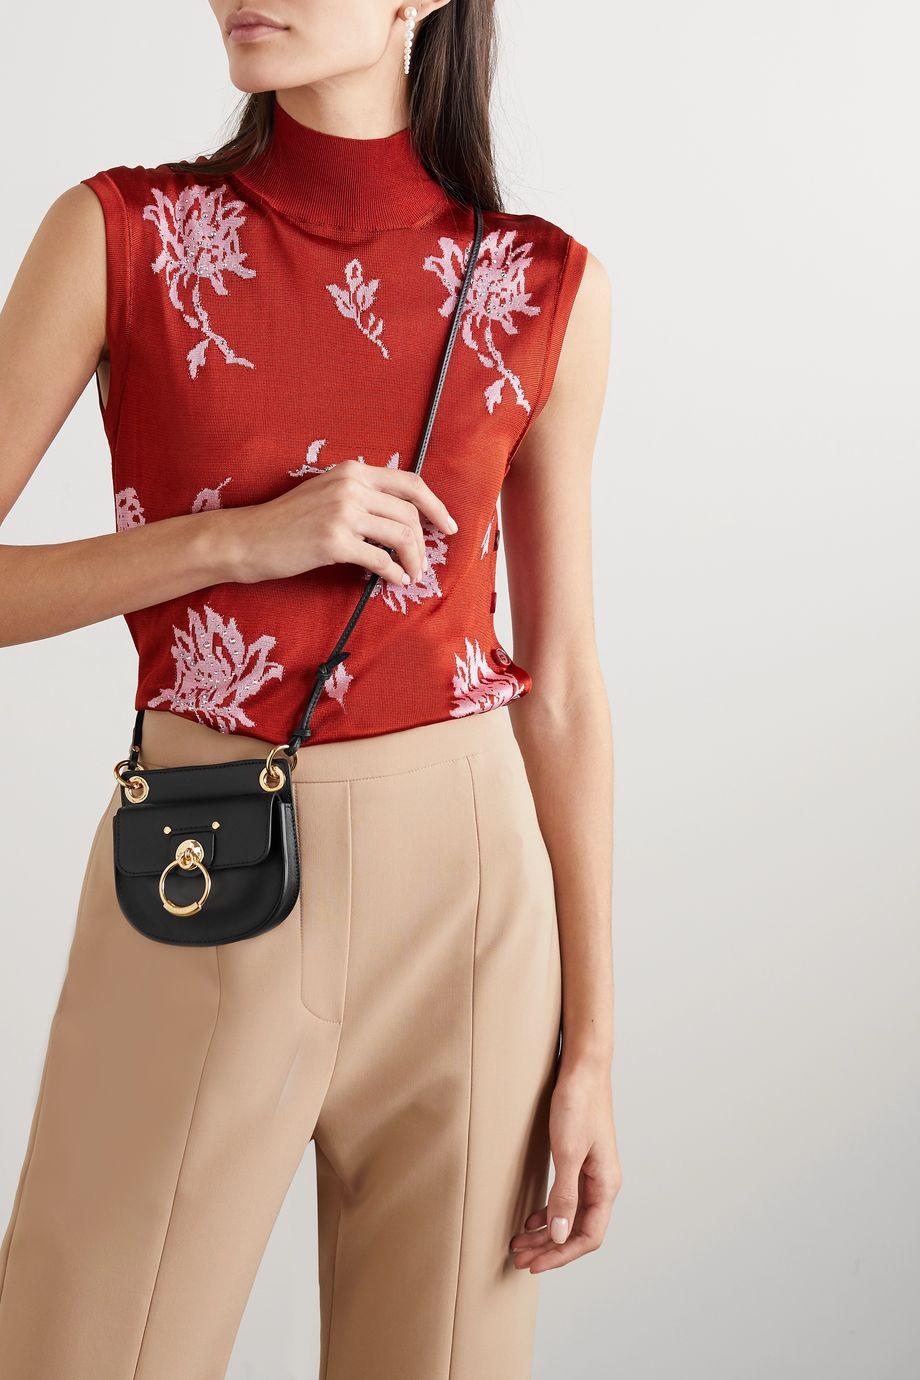 Chloé Tess mini leather shoulder bag